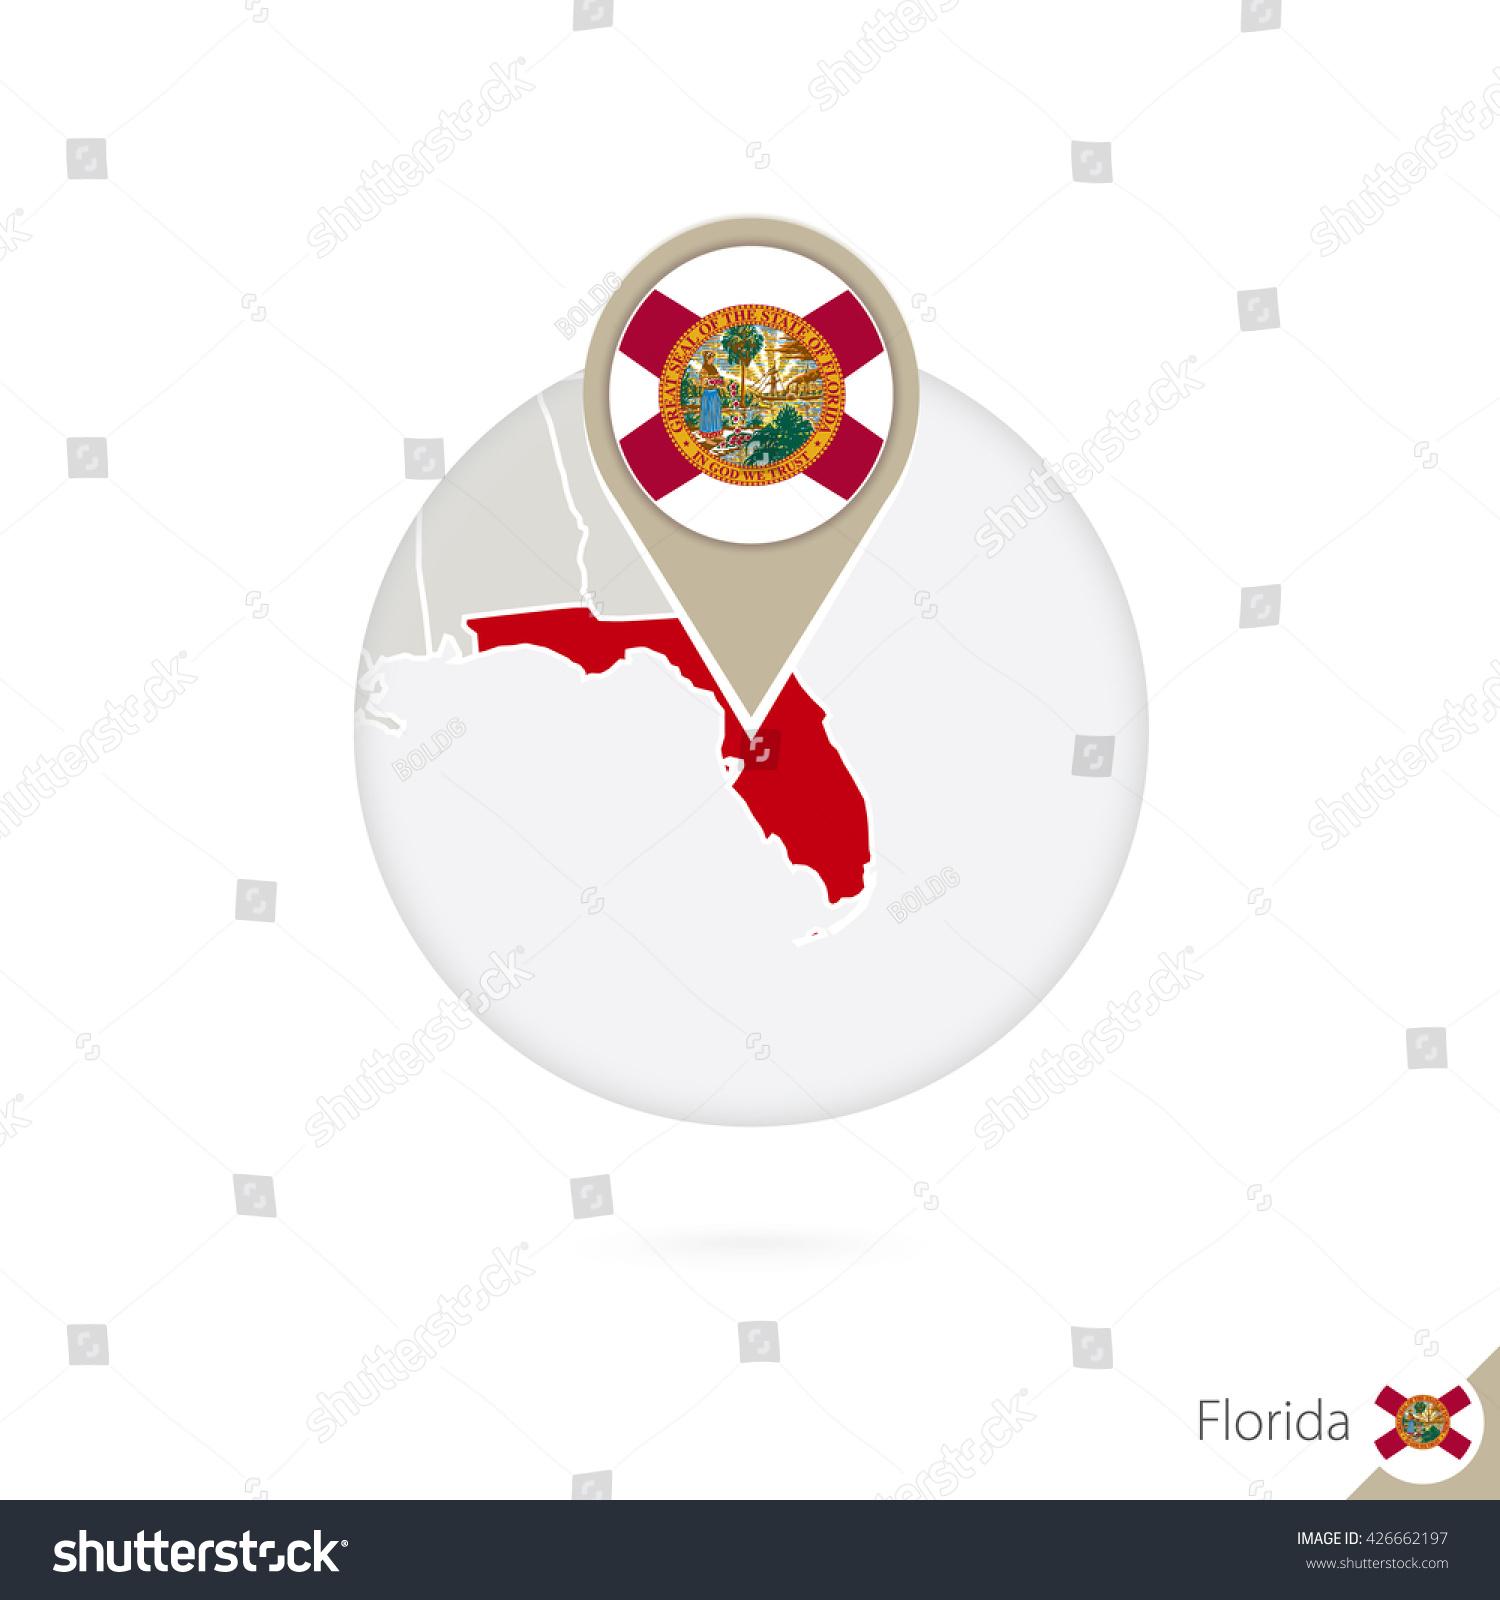 Florida Us State Map Flag Circle Stock Illustration - Map of florida in us